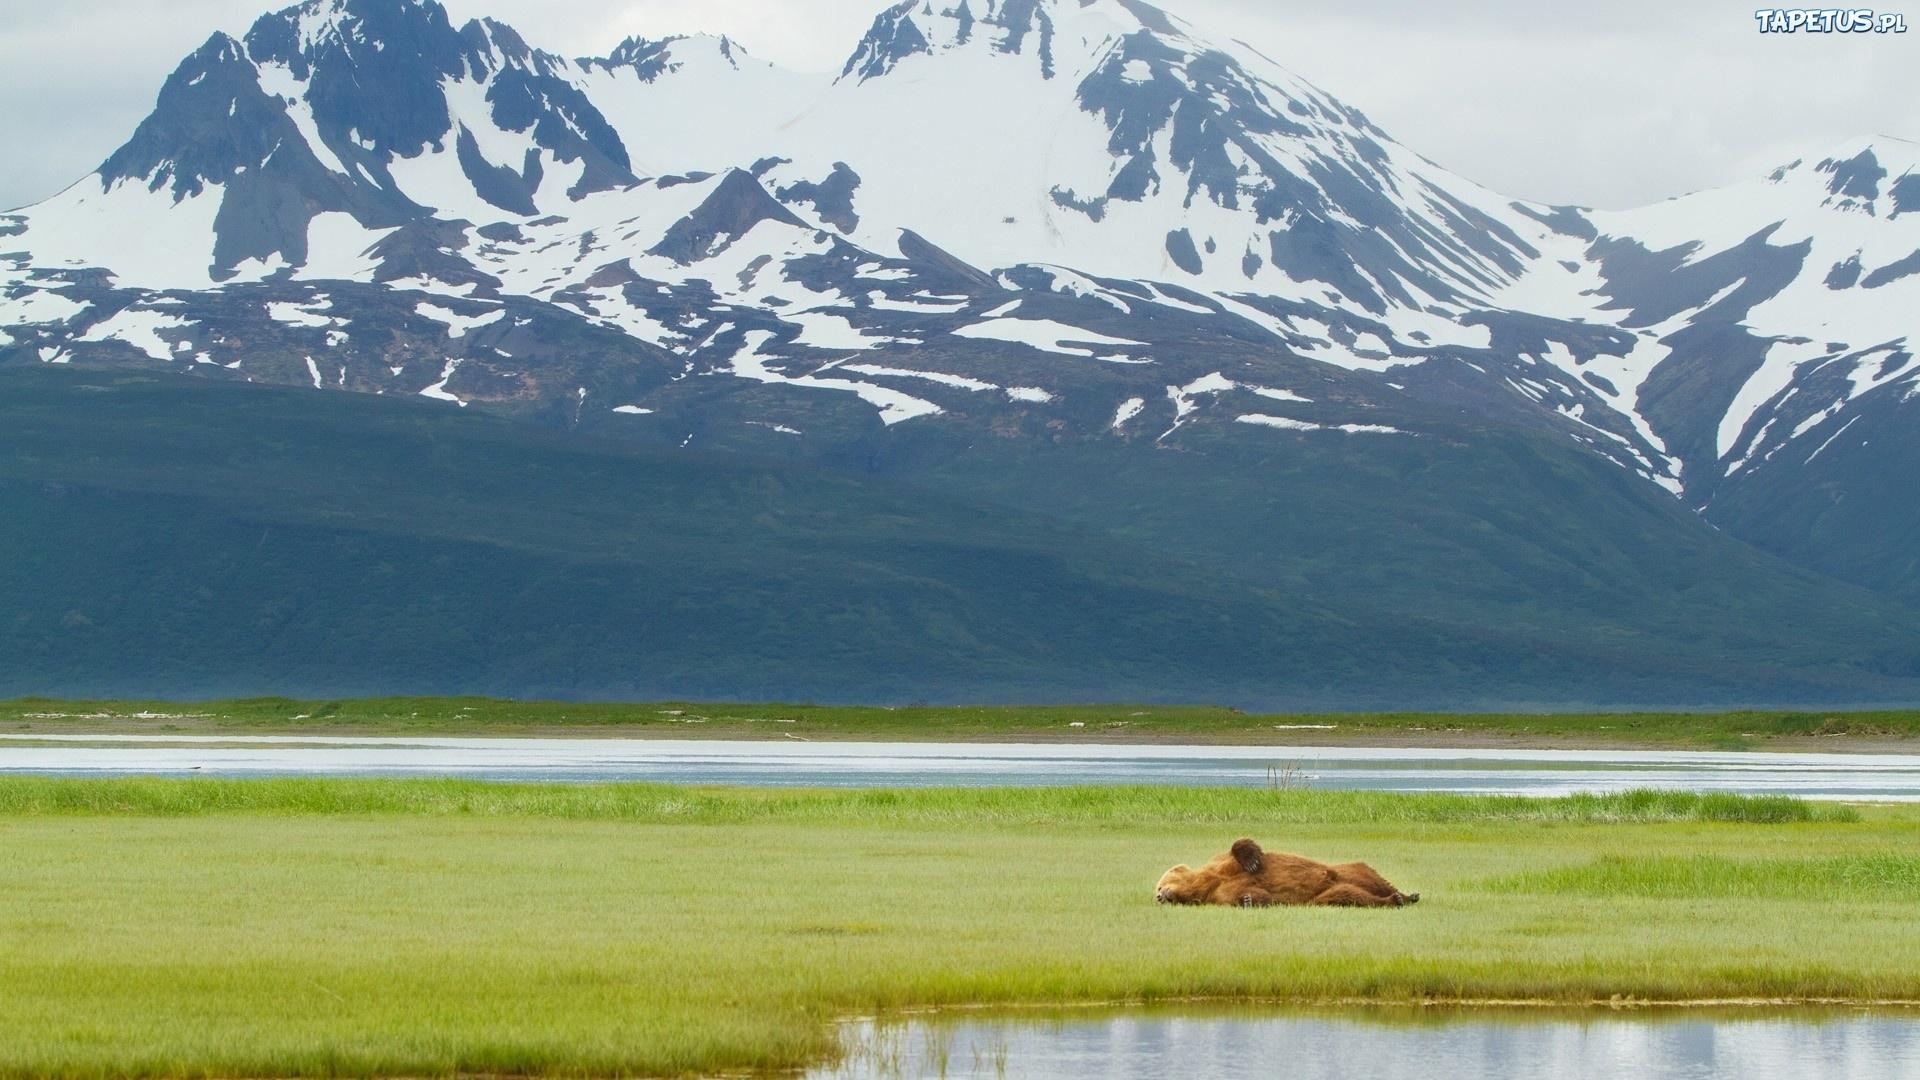 Alaskan Brown Bear Silhouetted Against Mount Katolinat, Alaska  № 1442458 бесплатно